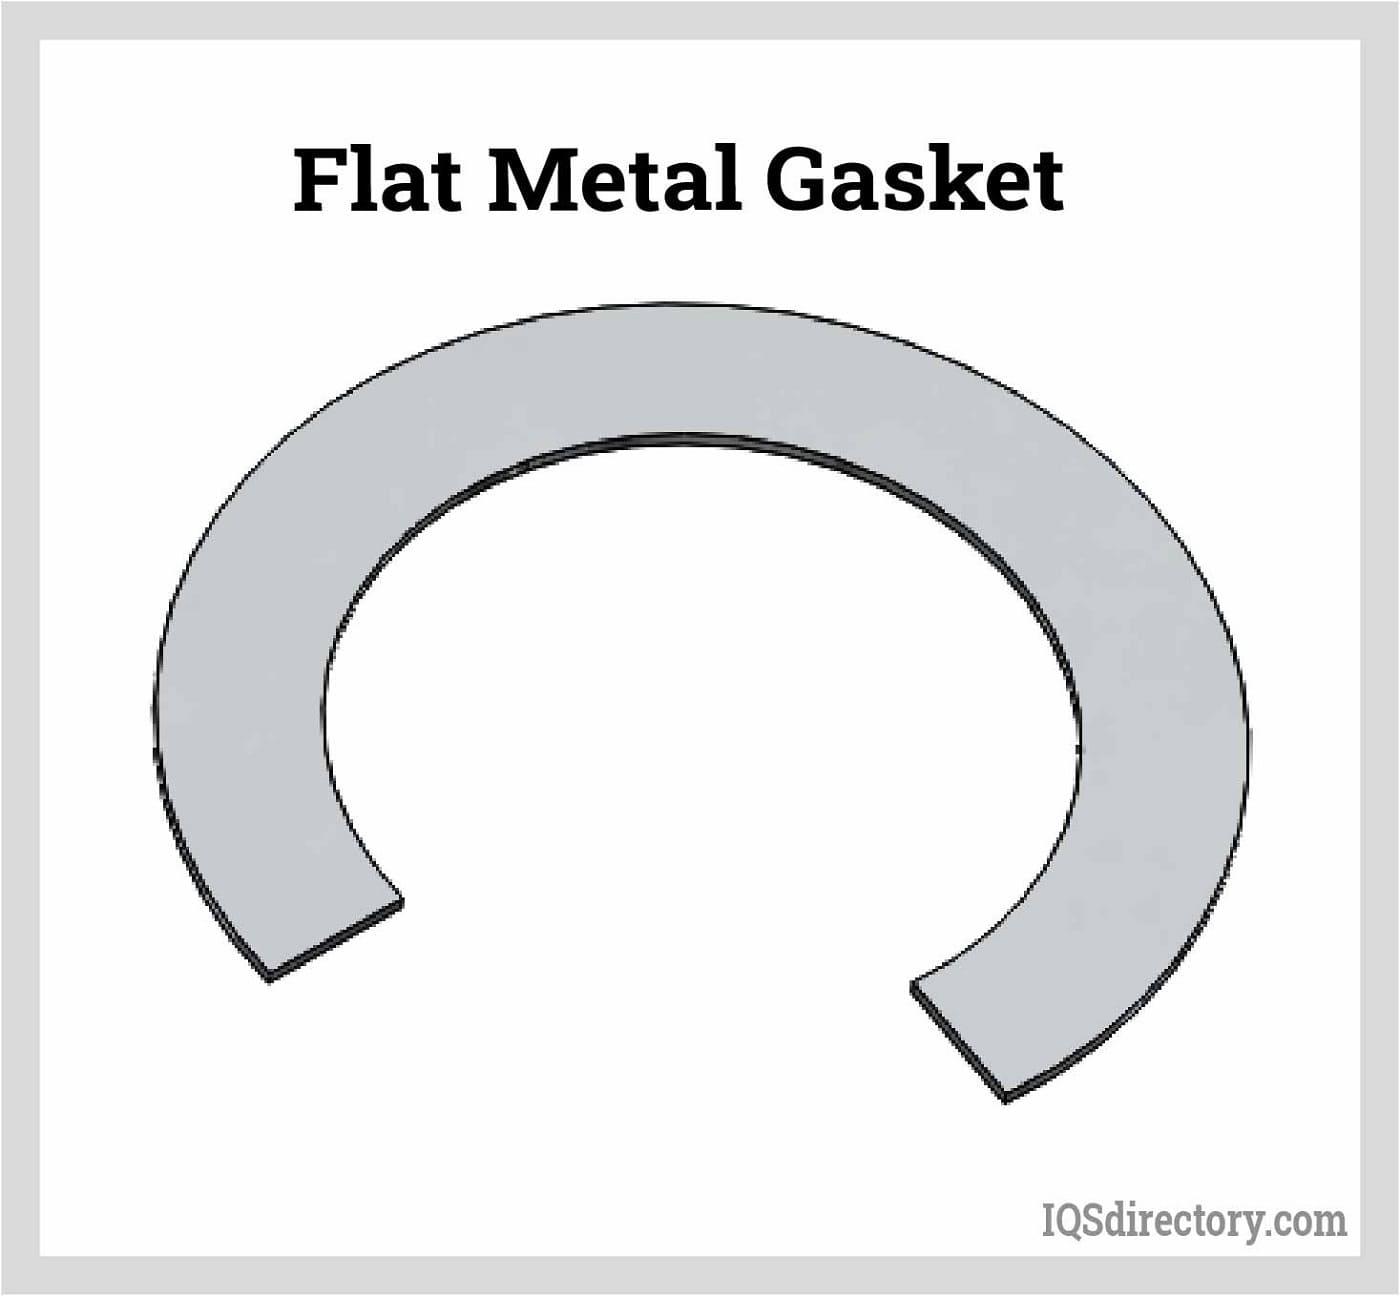 Flat Metal Gaskets